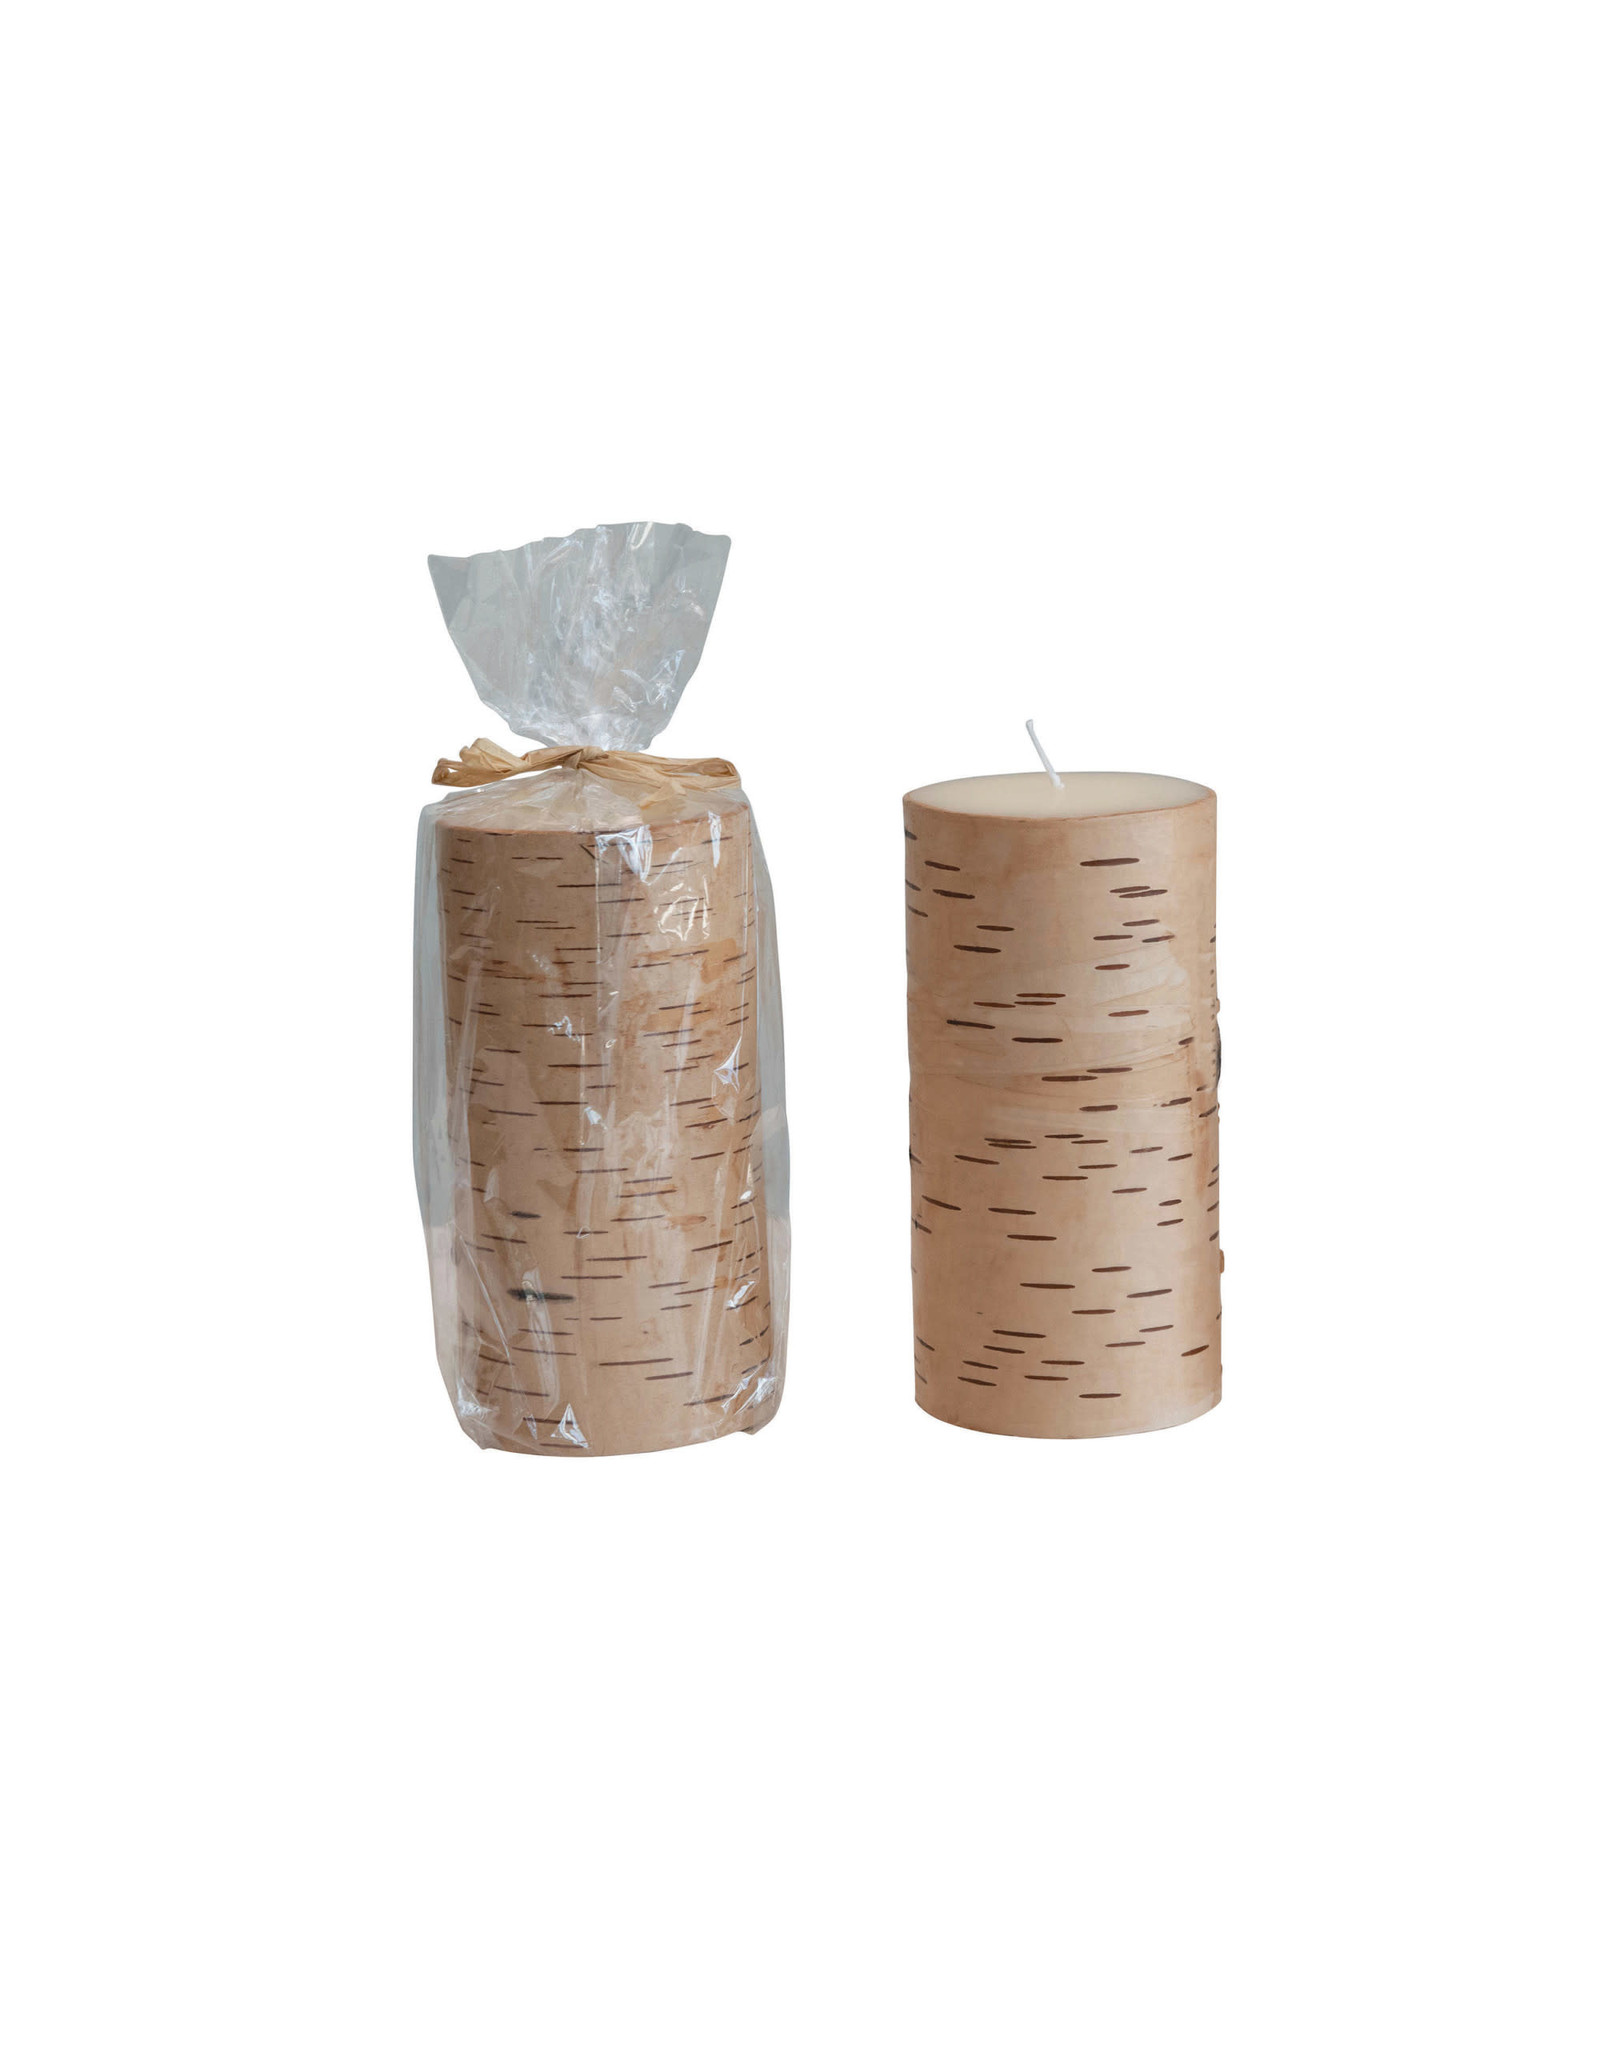 The Florist & The Merchant Birch Wrapped Pillar Candles